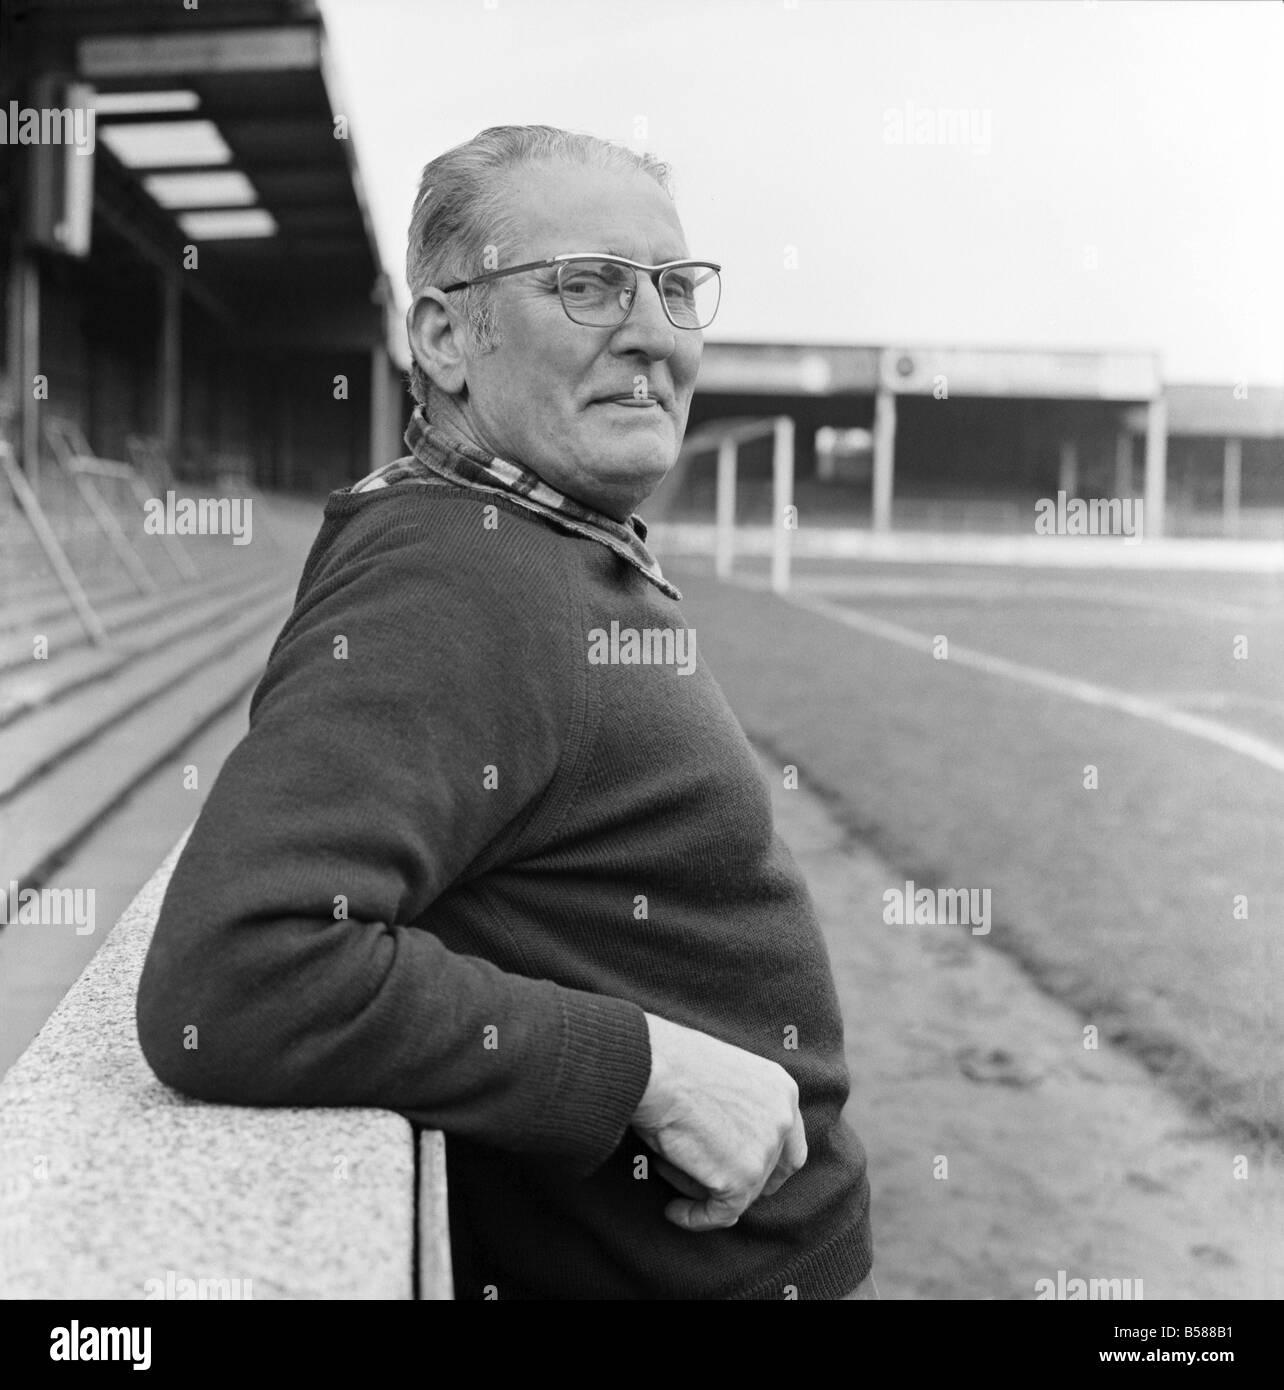 Old man/Grounds man/Humour. January 1975 75-00466 - Stock Image